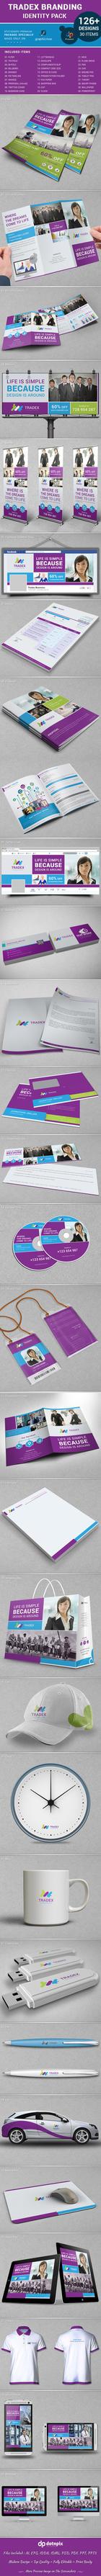 Tradex Branding Identity Pack by dotnpix